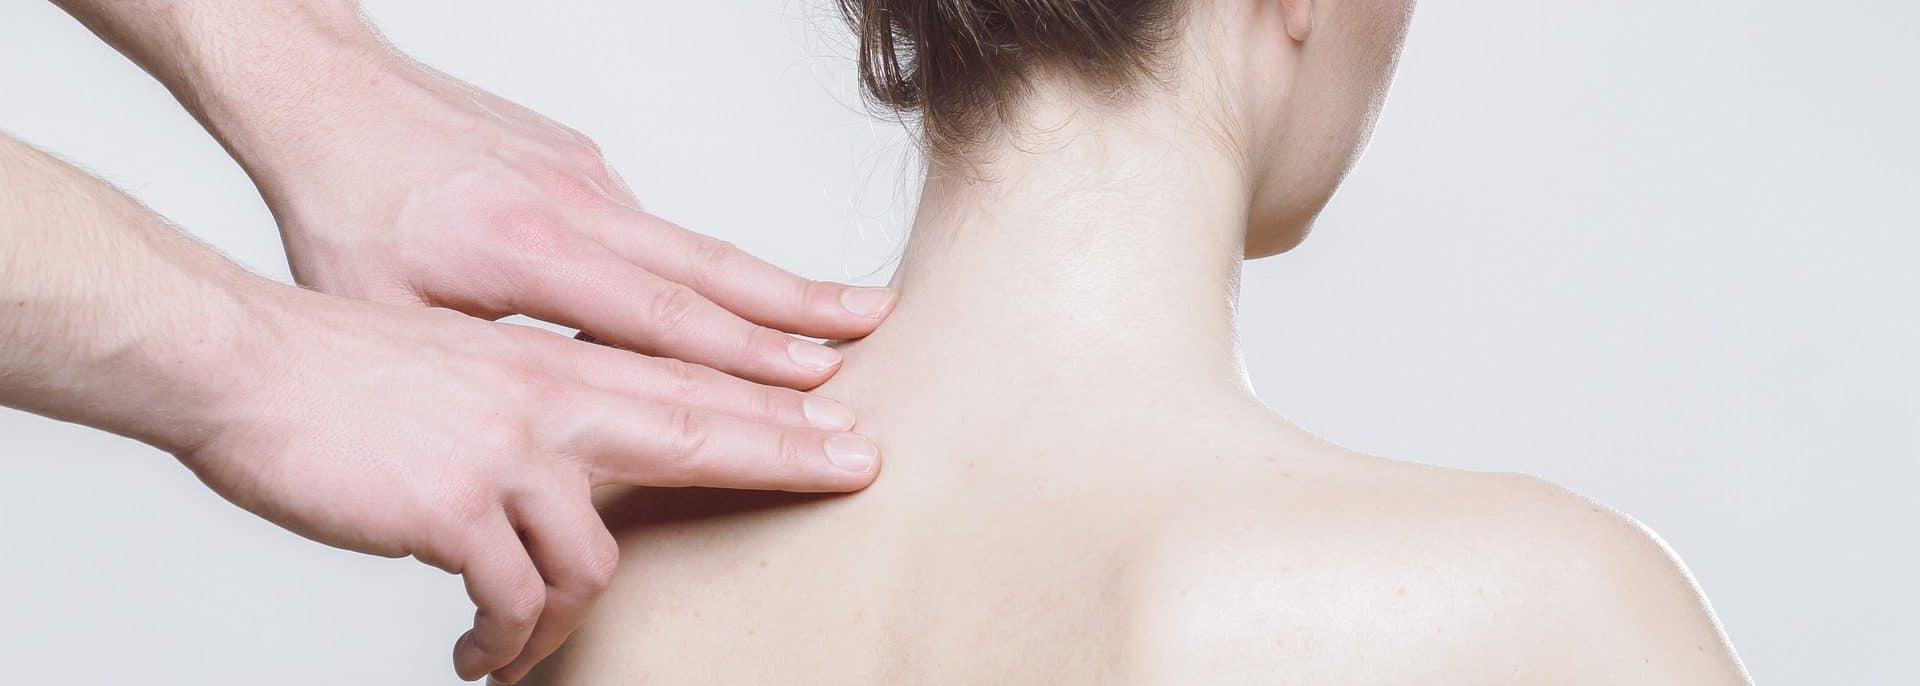 Massage gegen Muskelkater